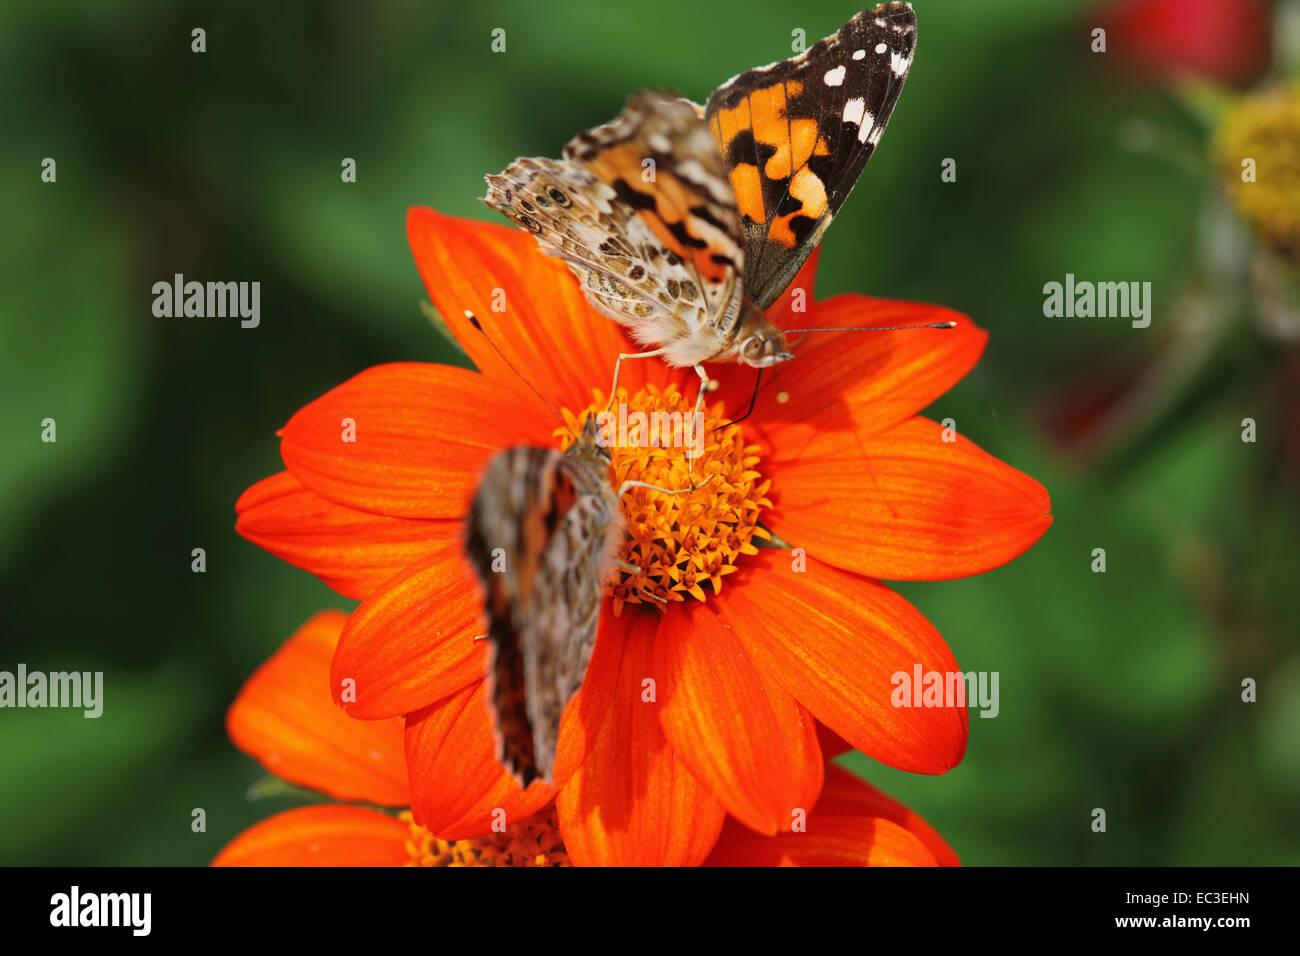 Painted lady, Vanessa cardui, Nymphalidae - Stock Image